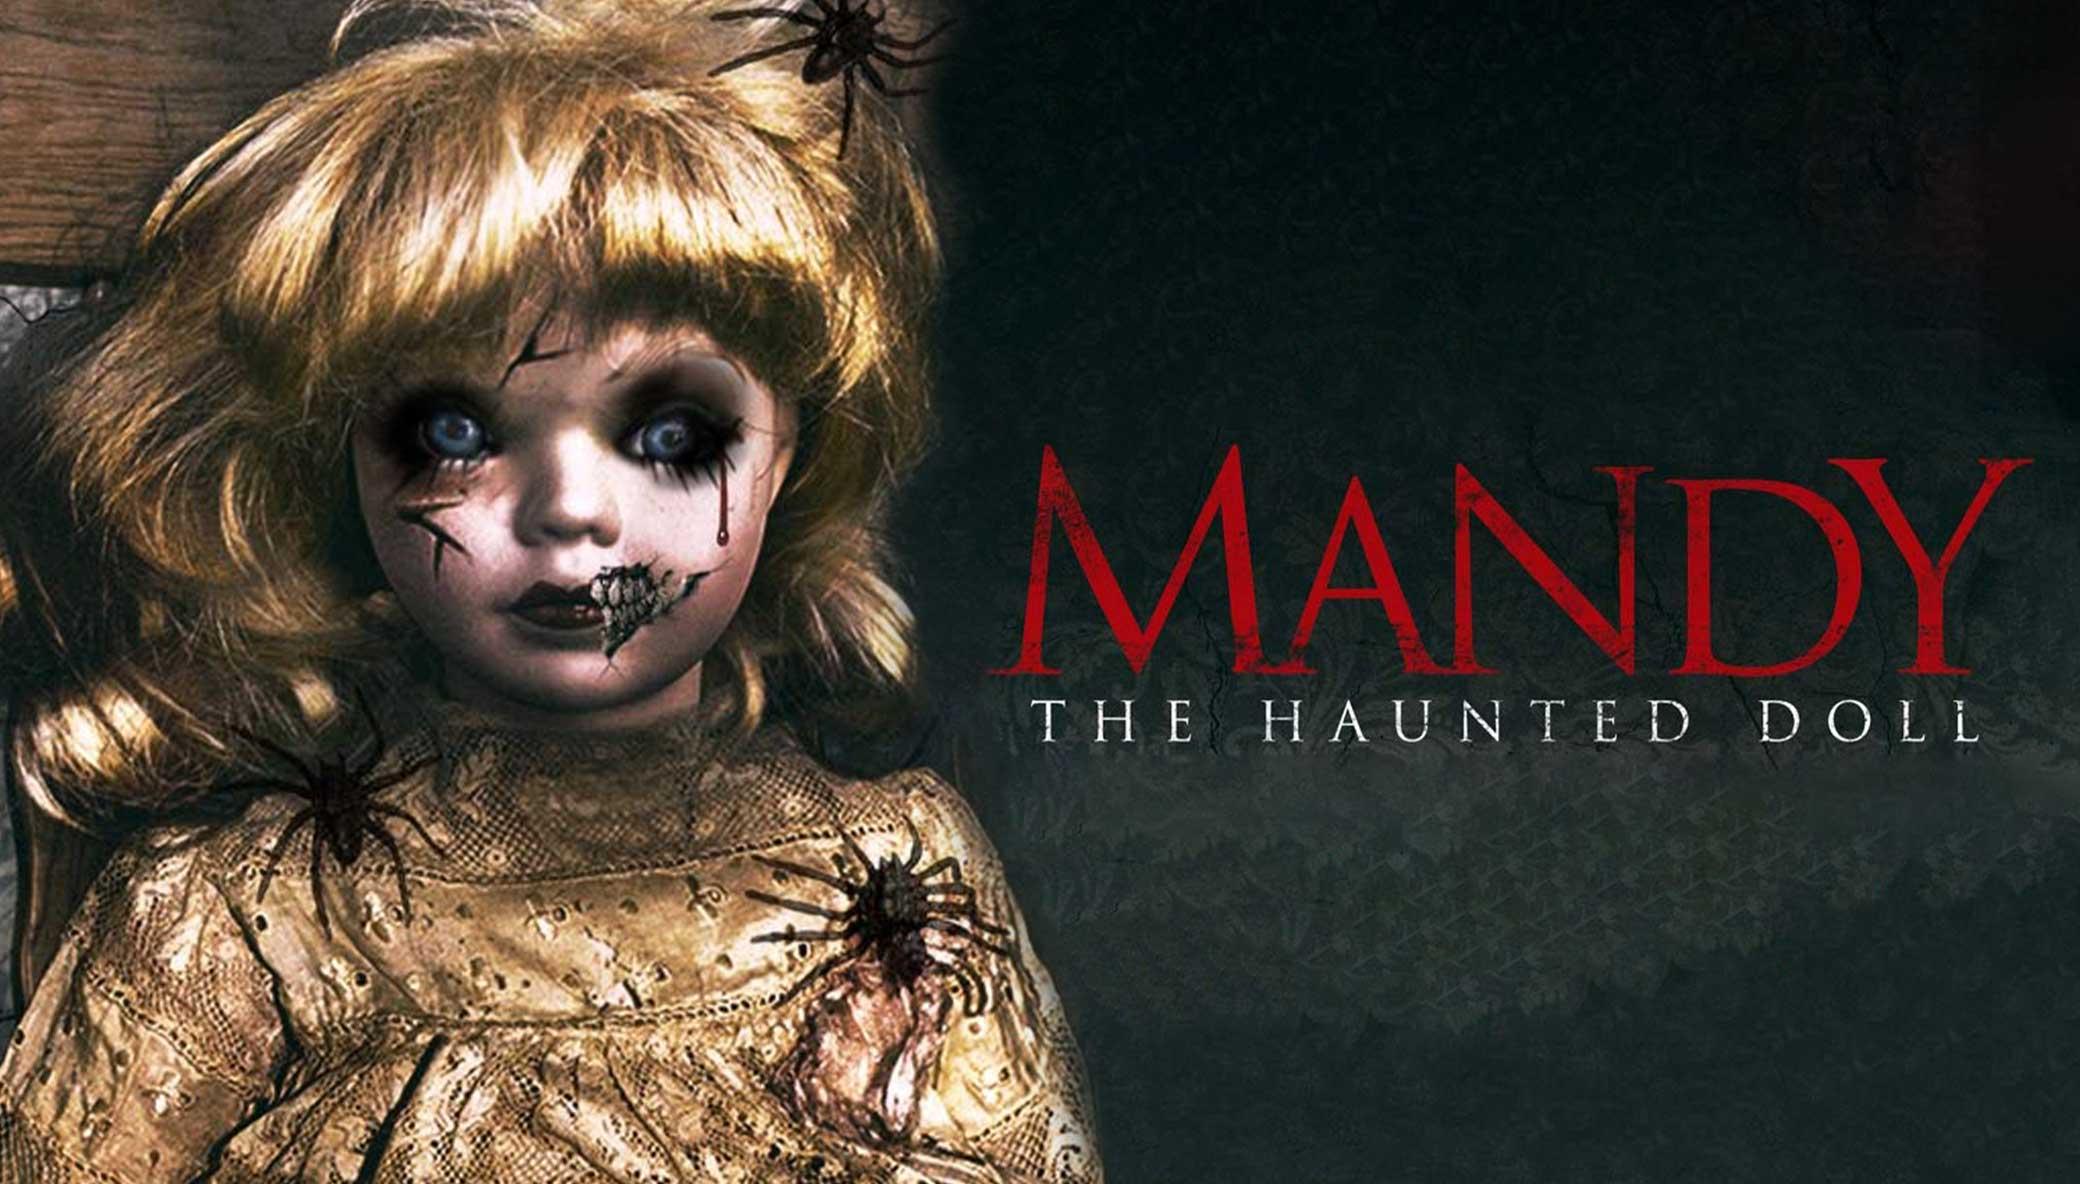 mandy-the-haunted-doll\header.jpg